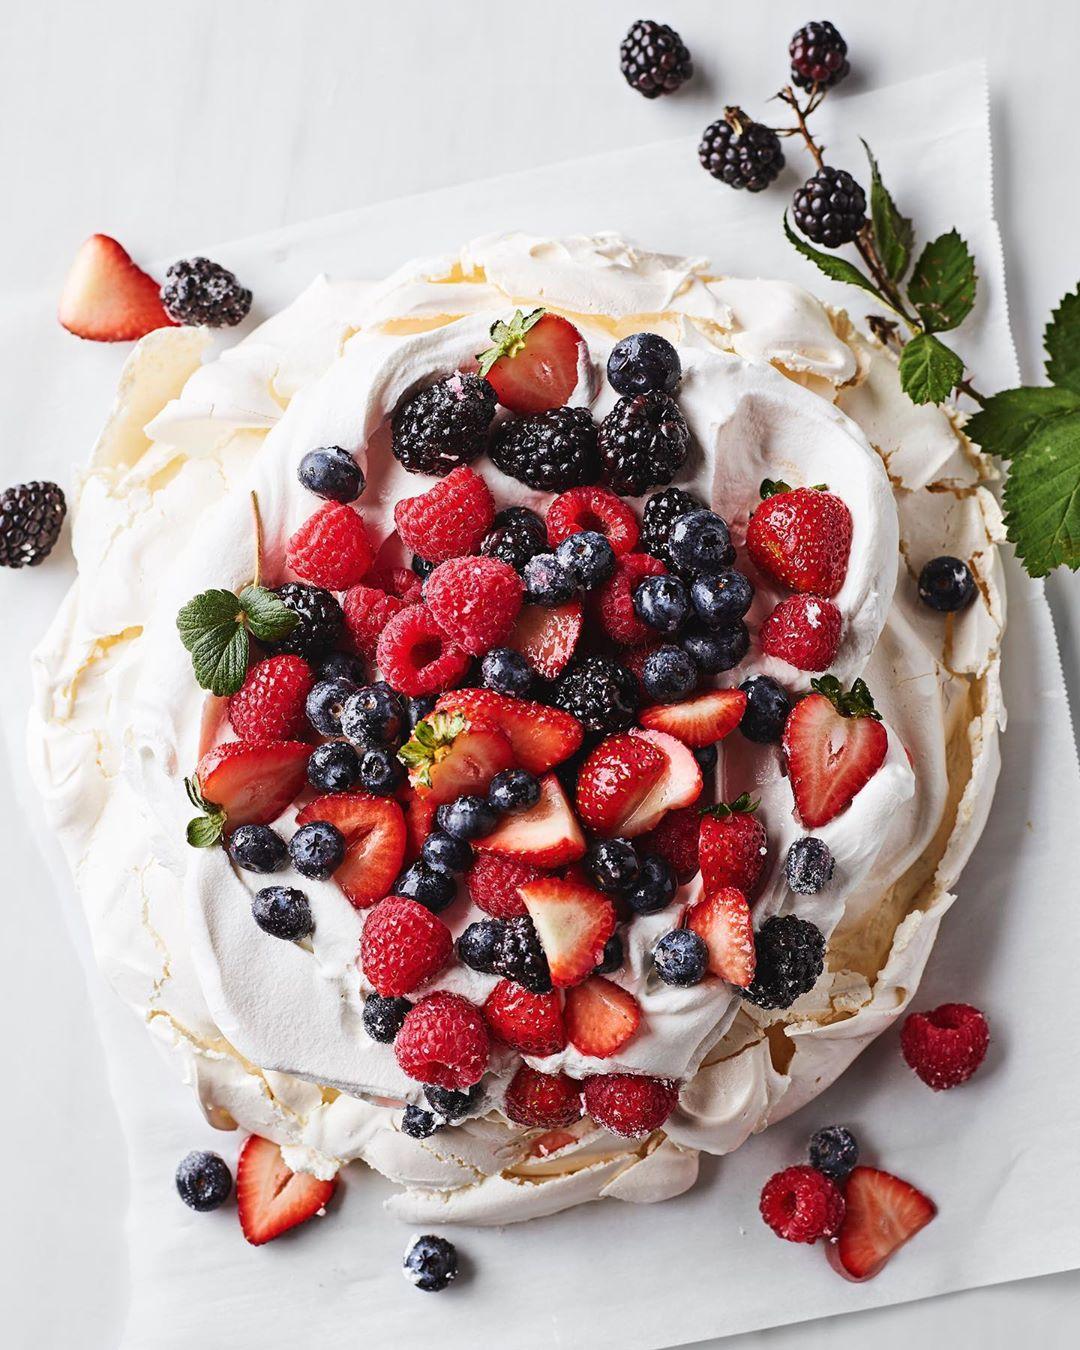 18 of Todays Captivating  Cake and Dessert Inspo for All  the Girls  Celebrating Something  ...